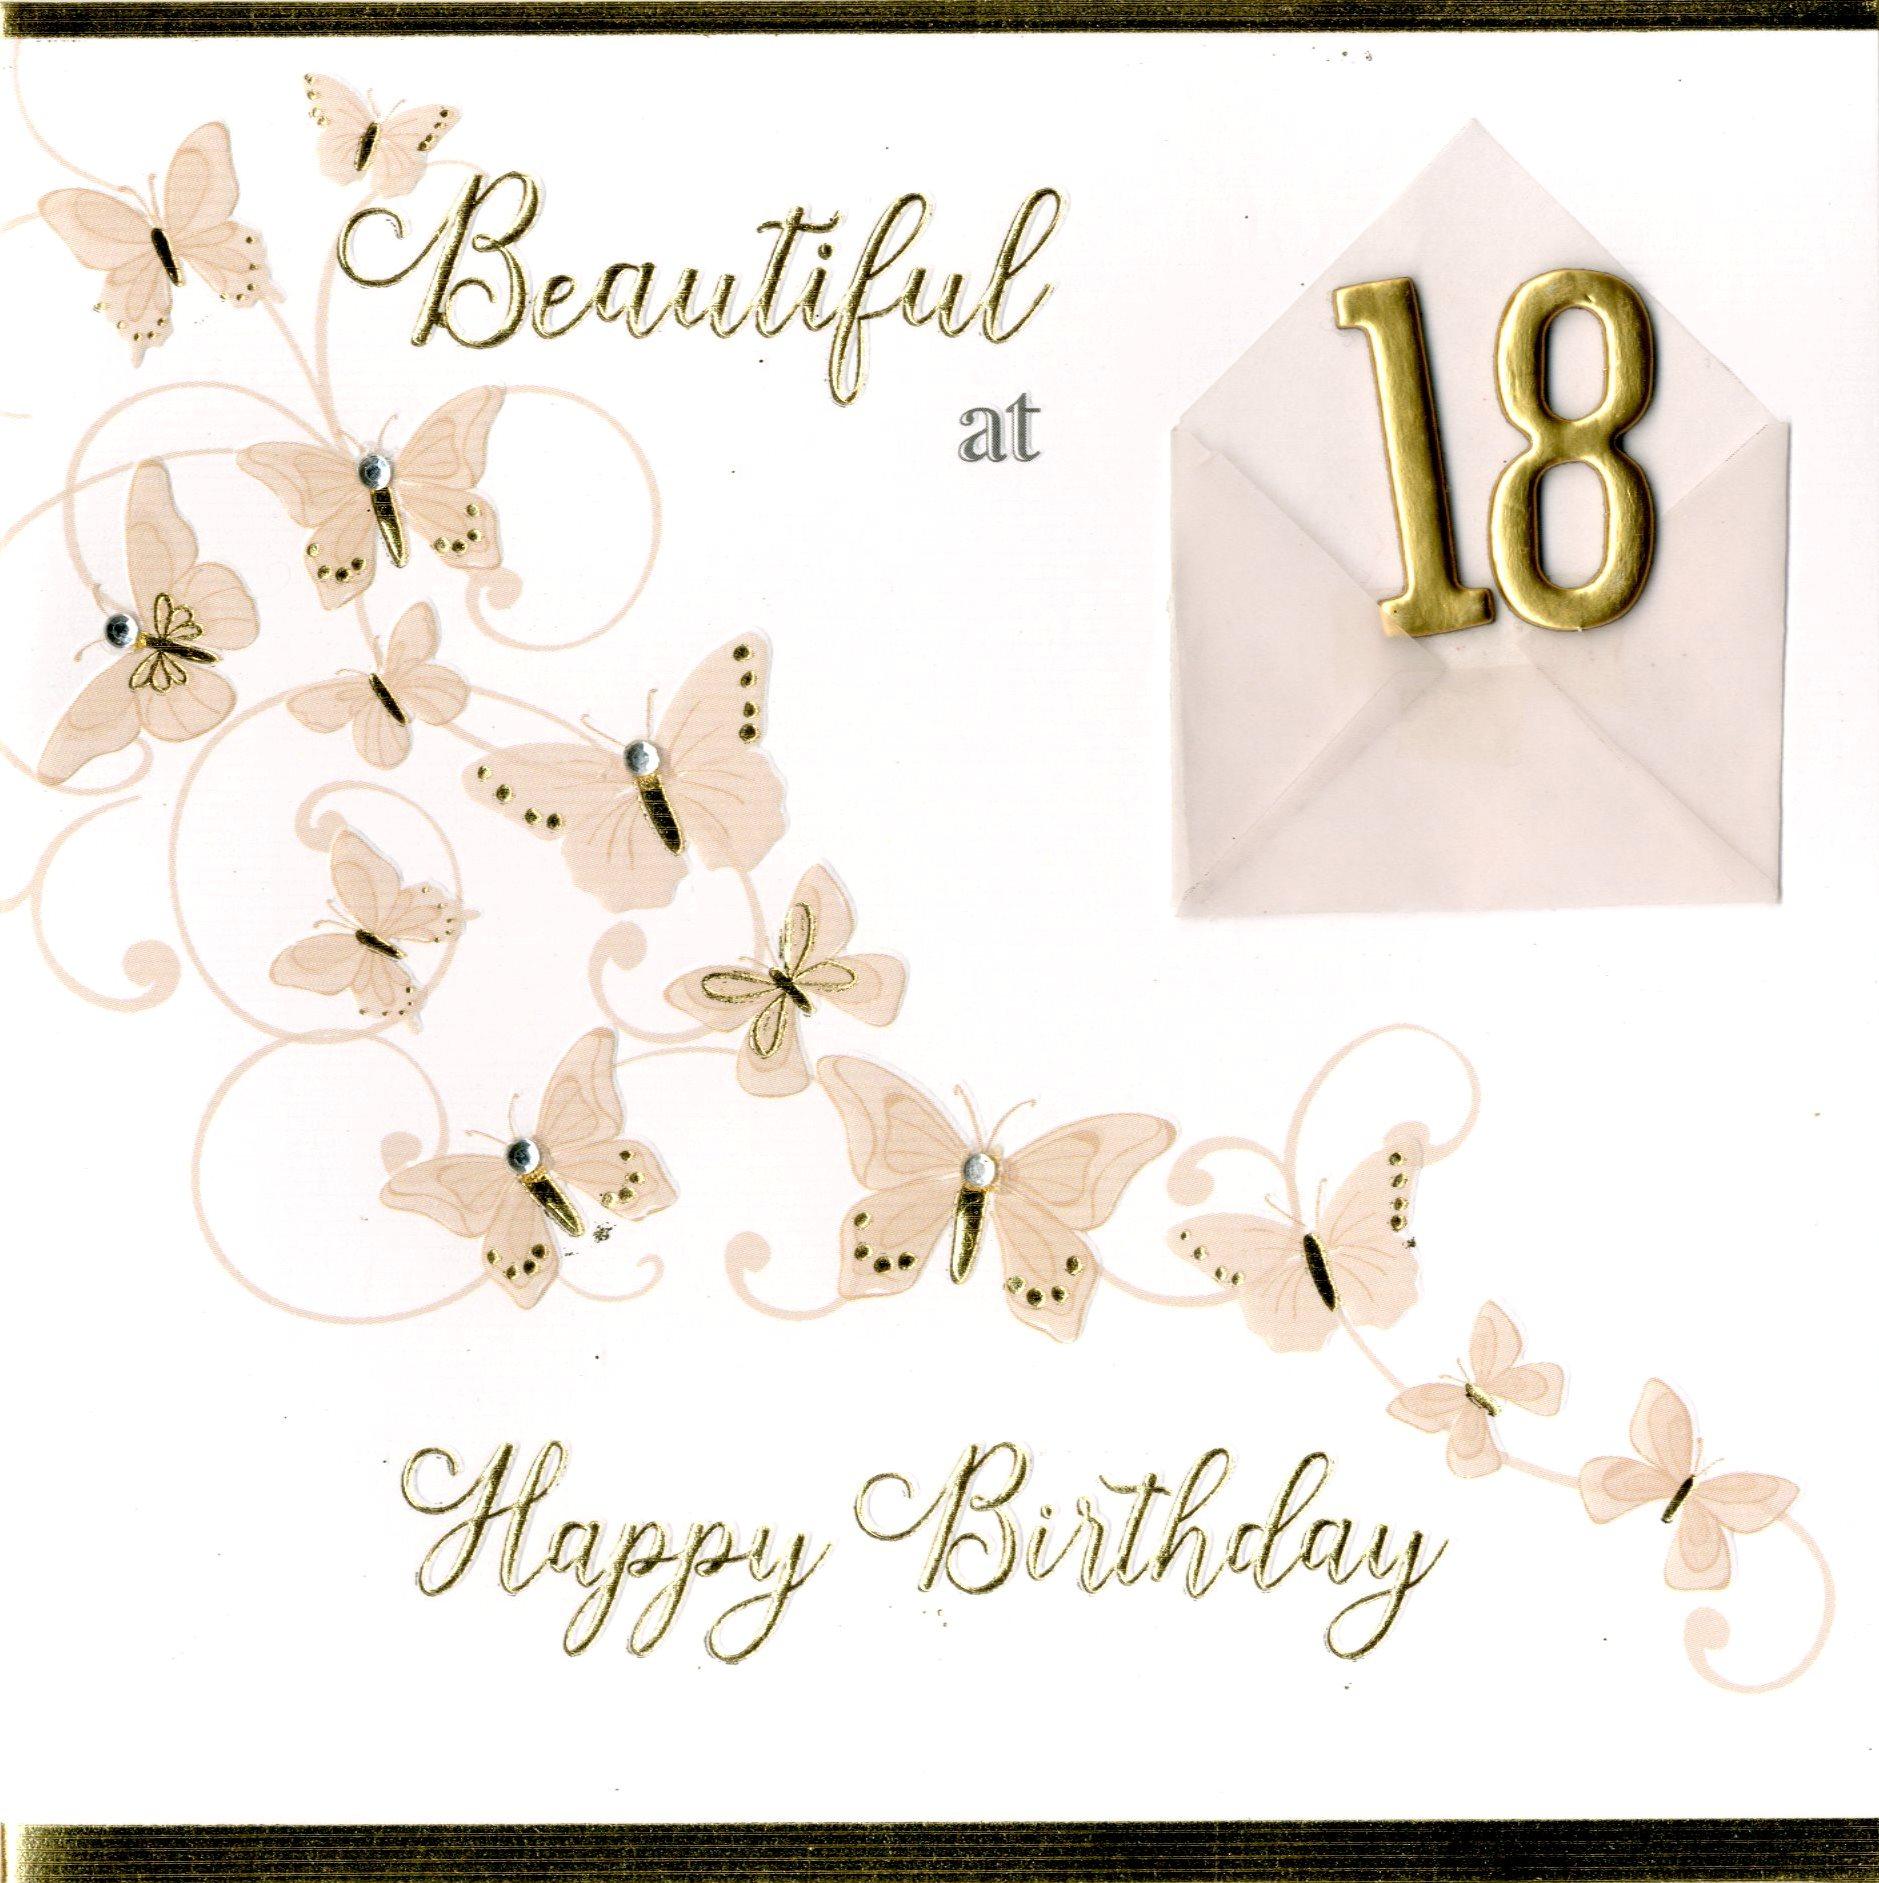 Beautiful At 18 18th Birthday Greeting Card Cards Love Kates